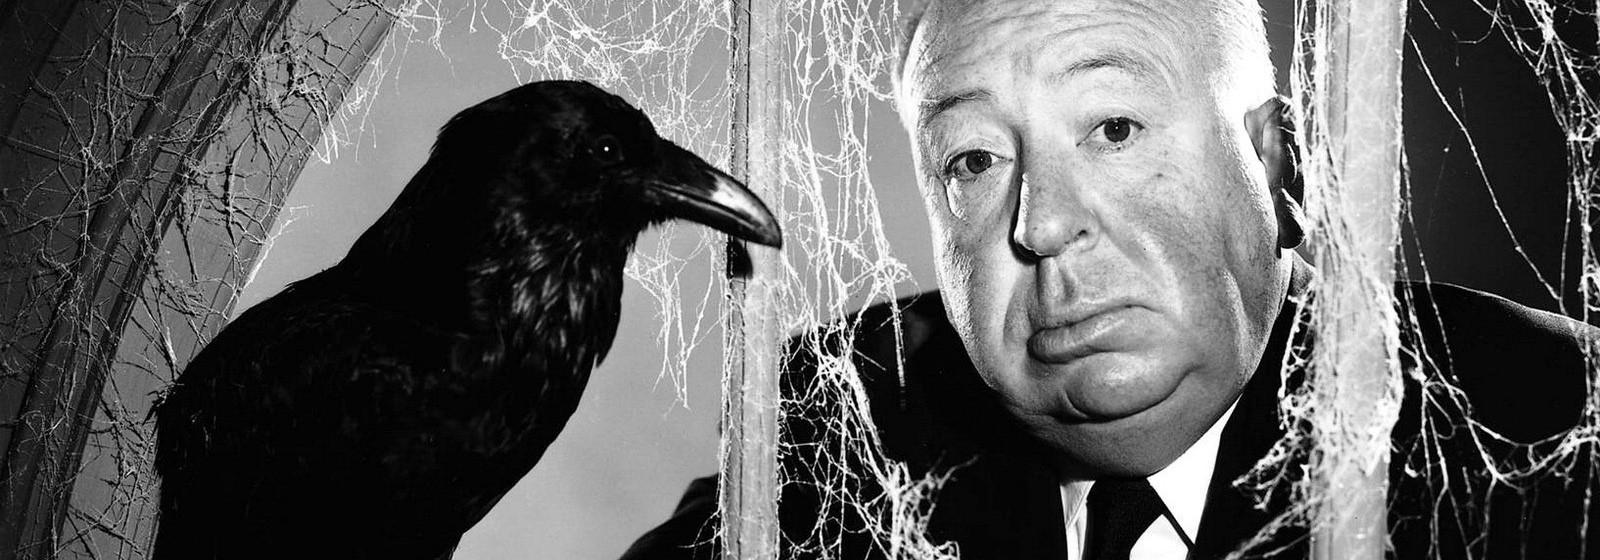 Especial Hitchcock